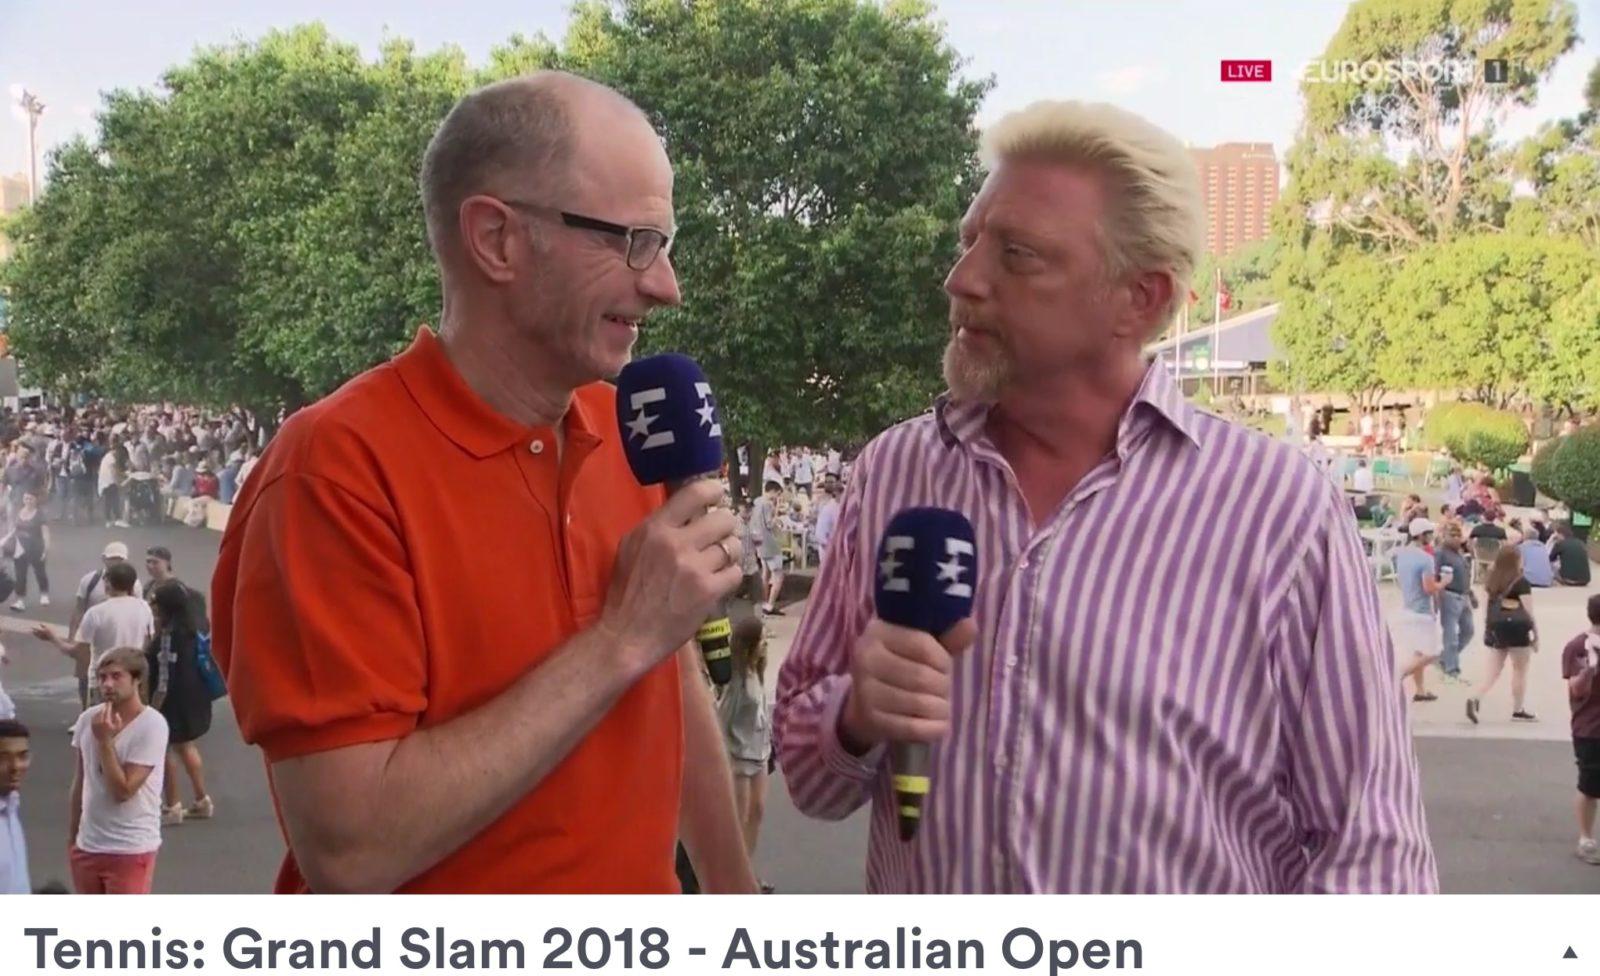 Matthias Stach und Boris Becker Eurosport Tennis Moderatoren Foto (C) Eurosport TV